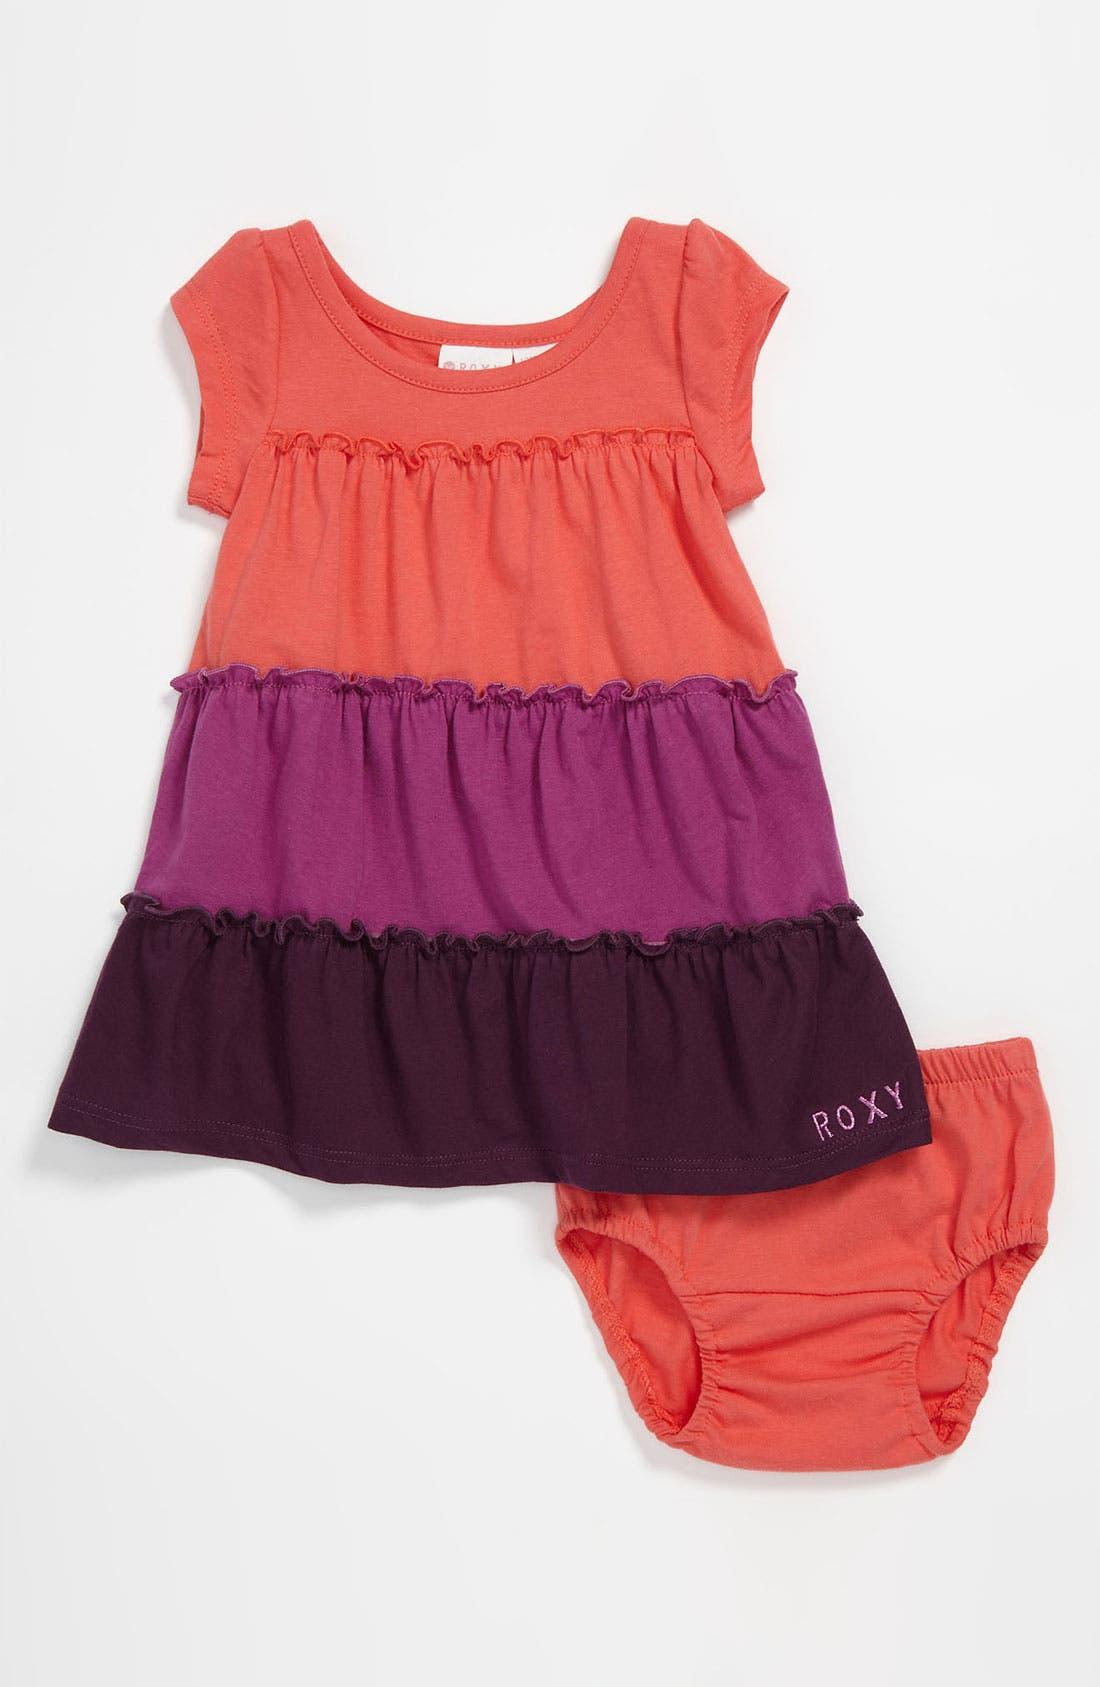 Alternate Image 1 Selected - Roxy 'Cider' Colorblock Dress (Infant)